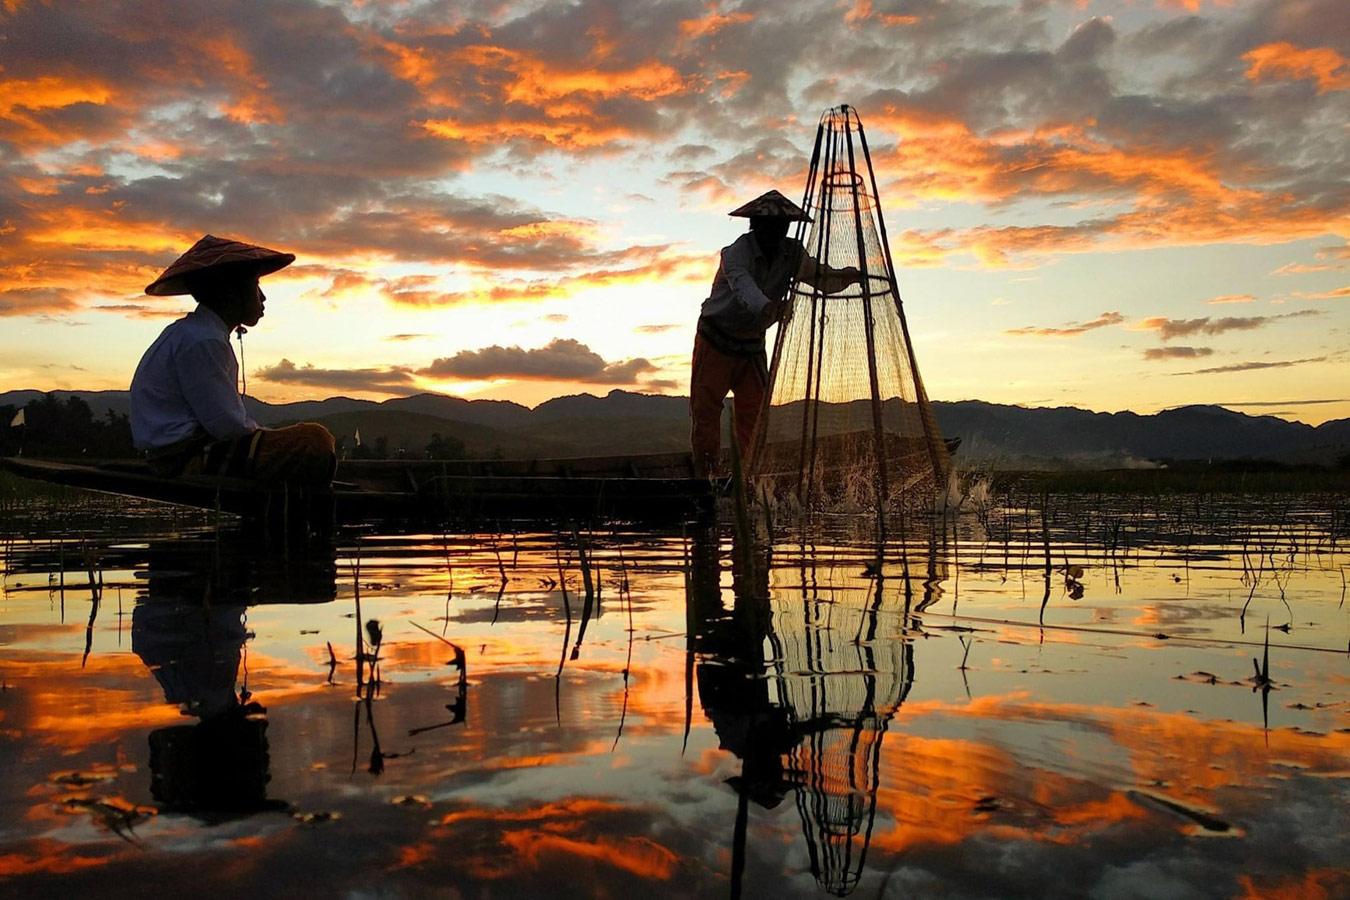 © Аунг Ту Хайн, Мьянма, Конкурс мобильной фотографии Xiaomi